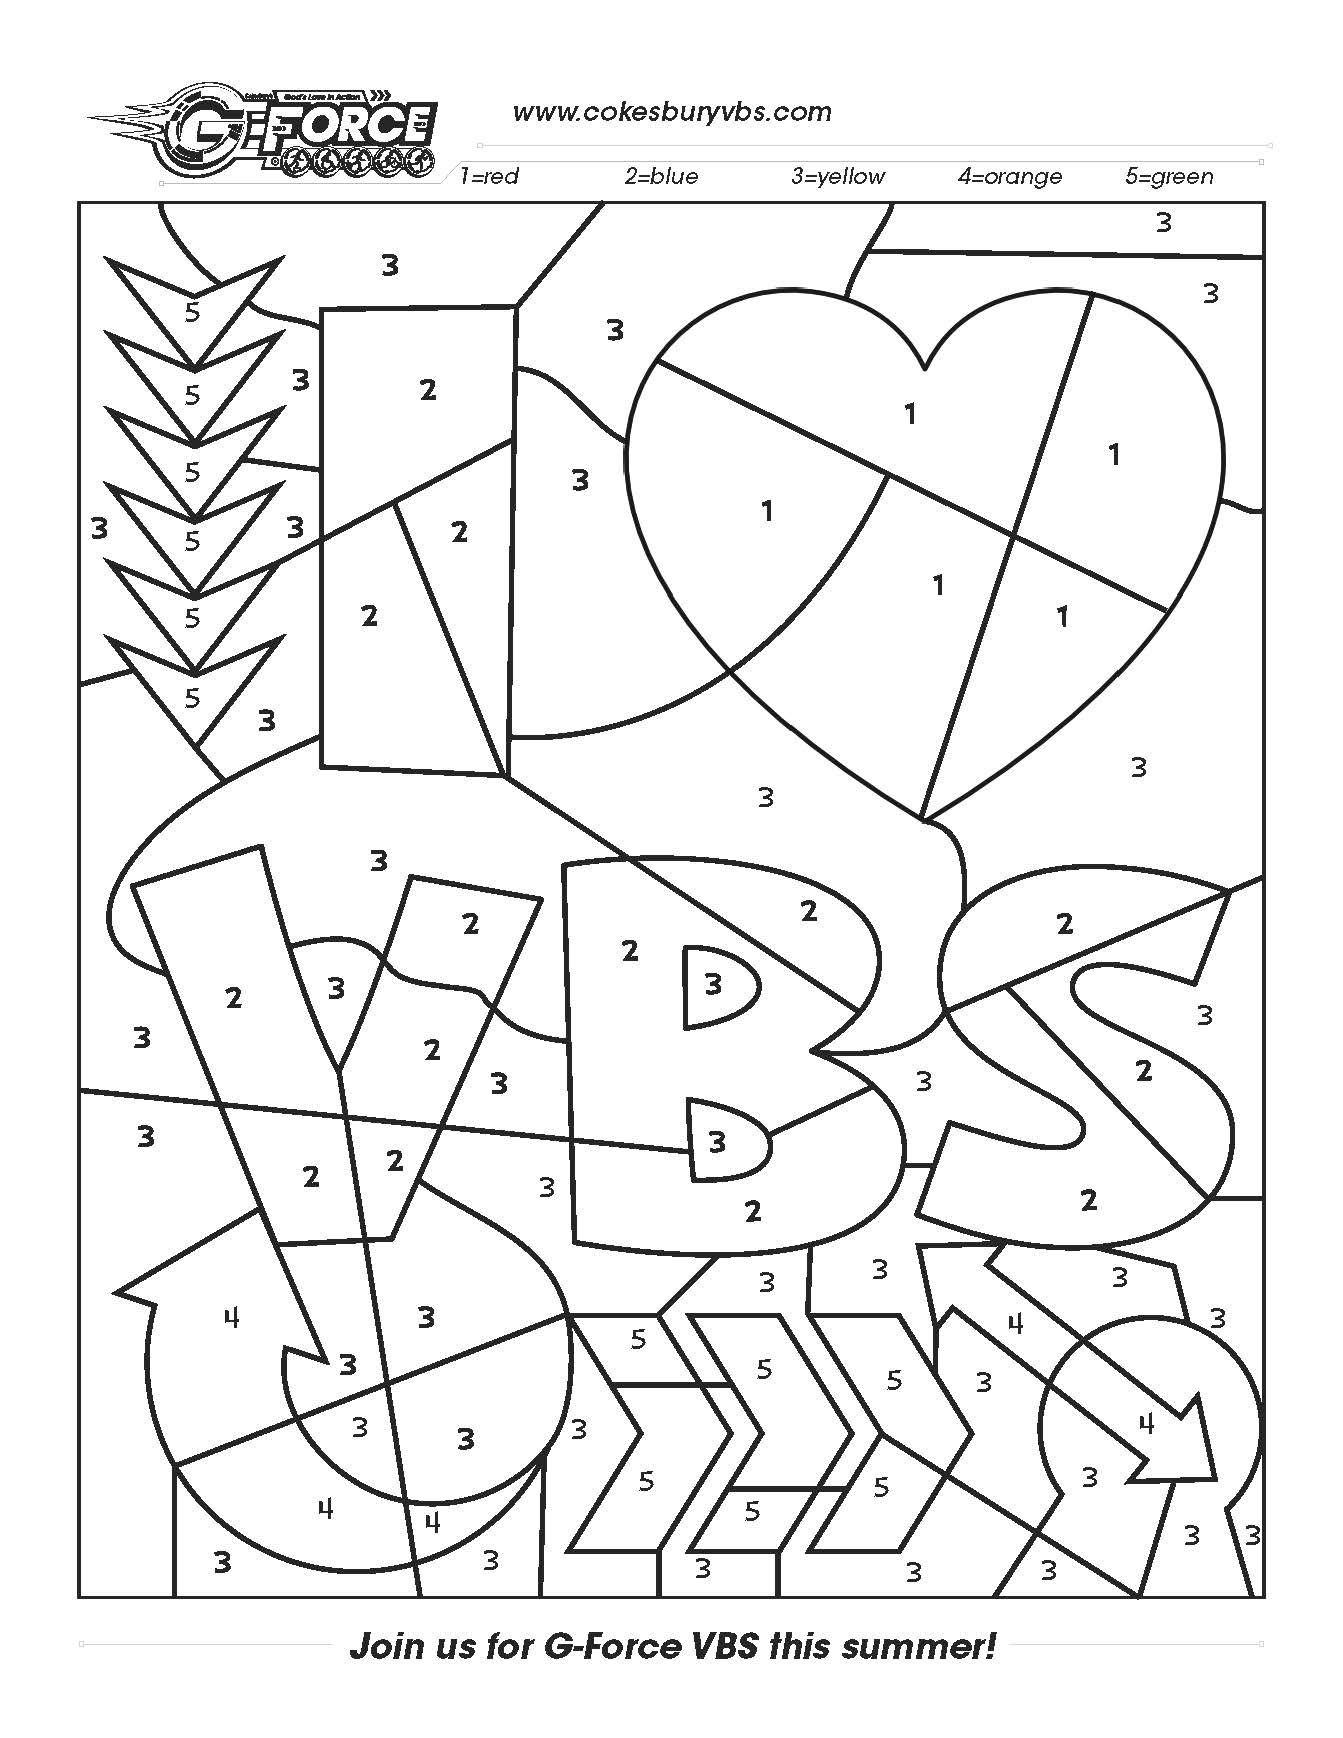 Fun activity sheet to use anytime! cokesburyvbs.com | VBS ideas ...